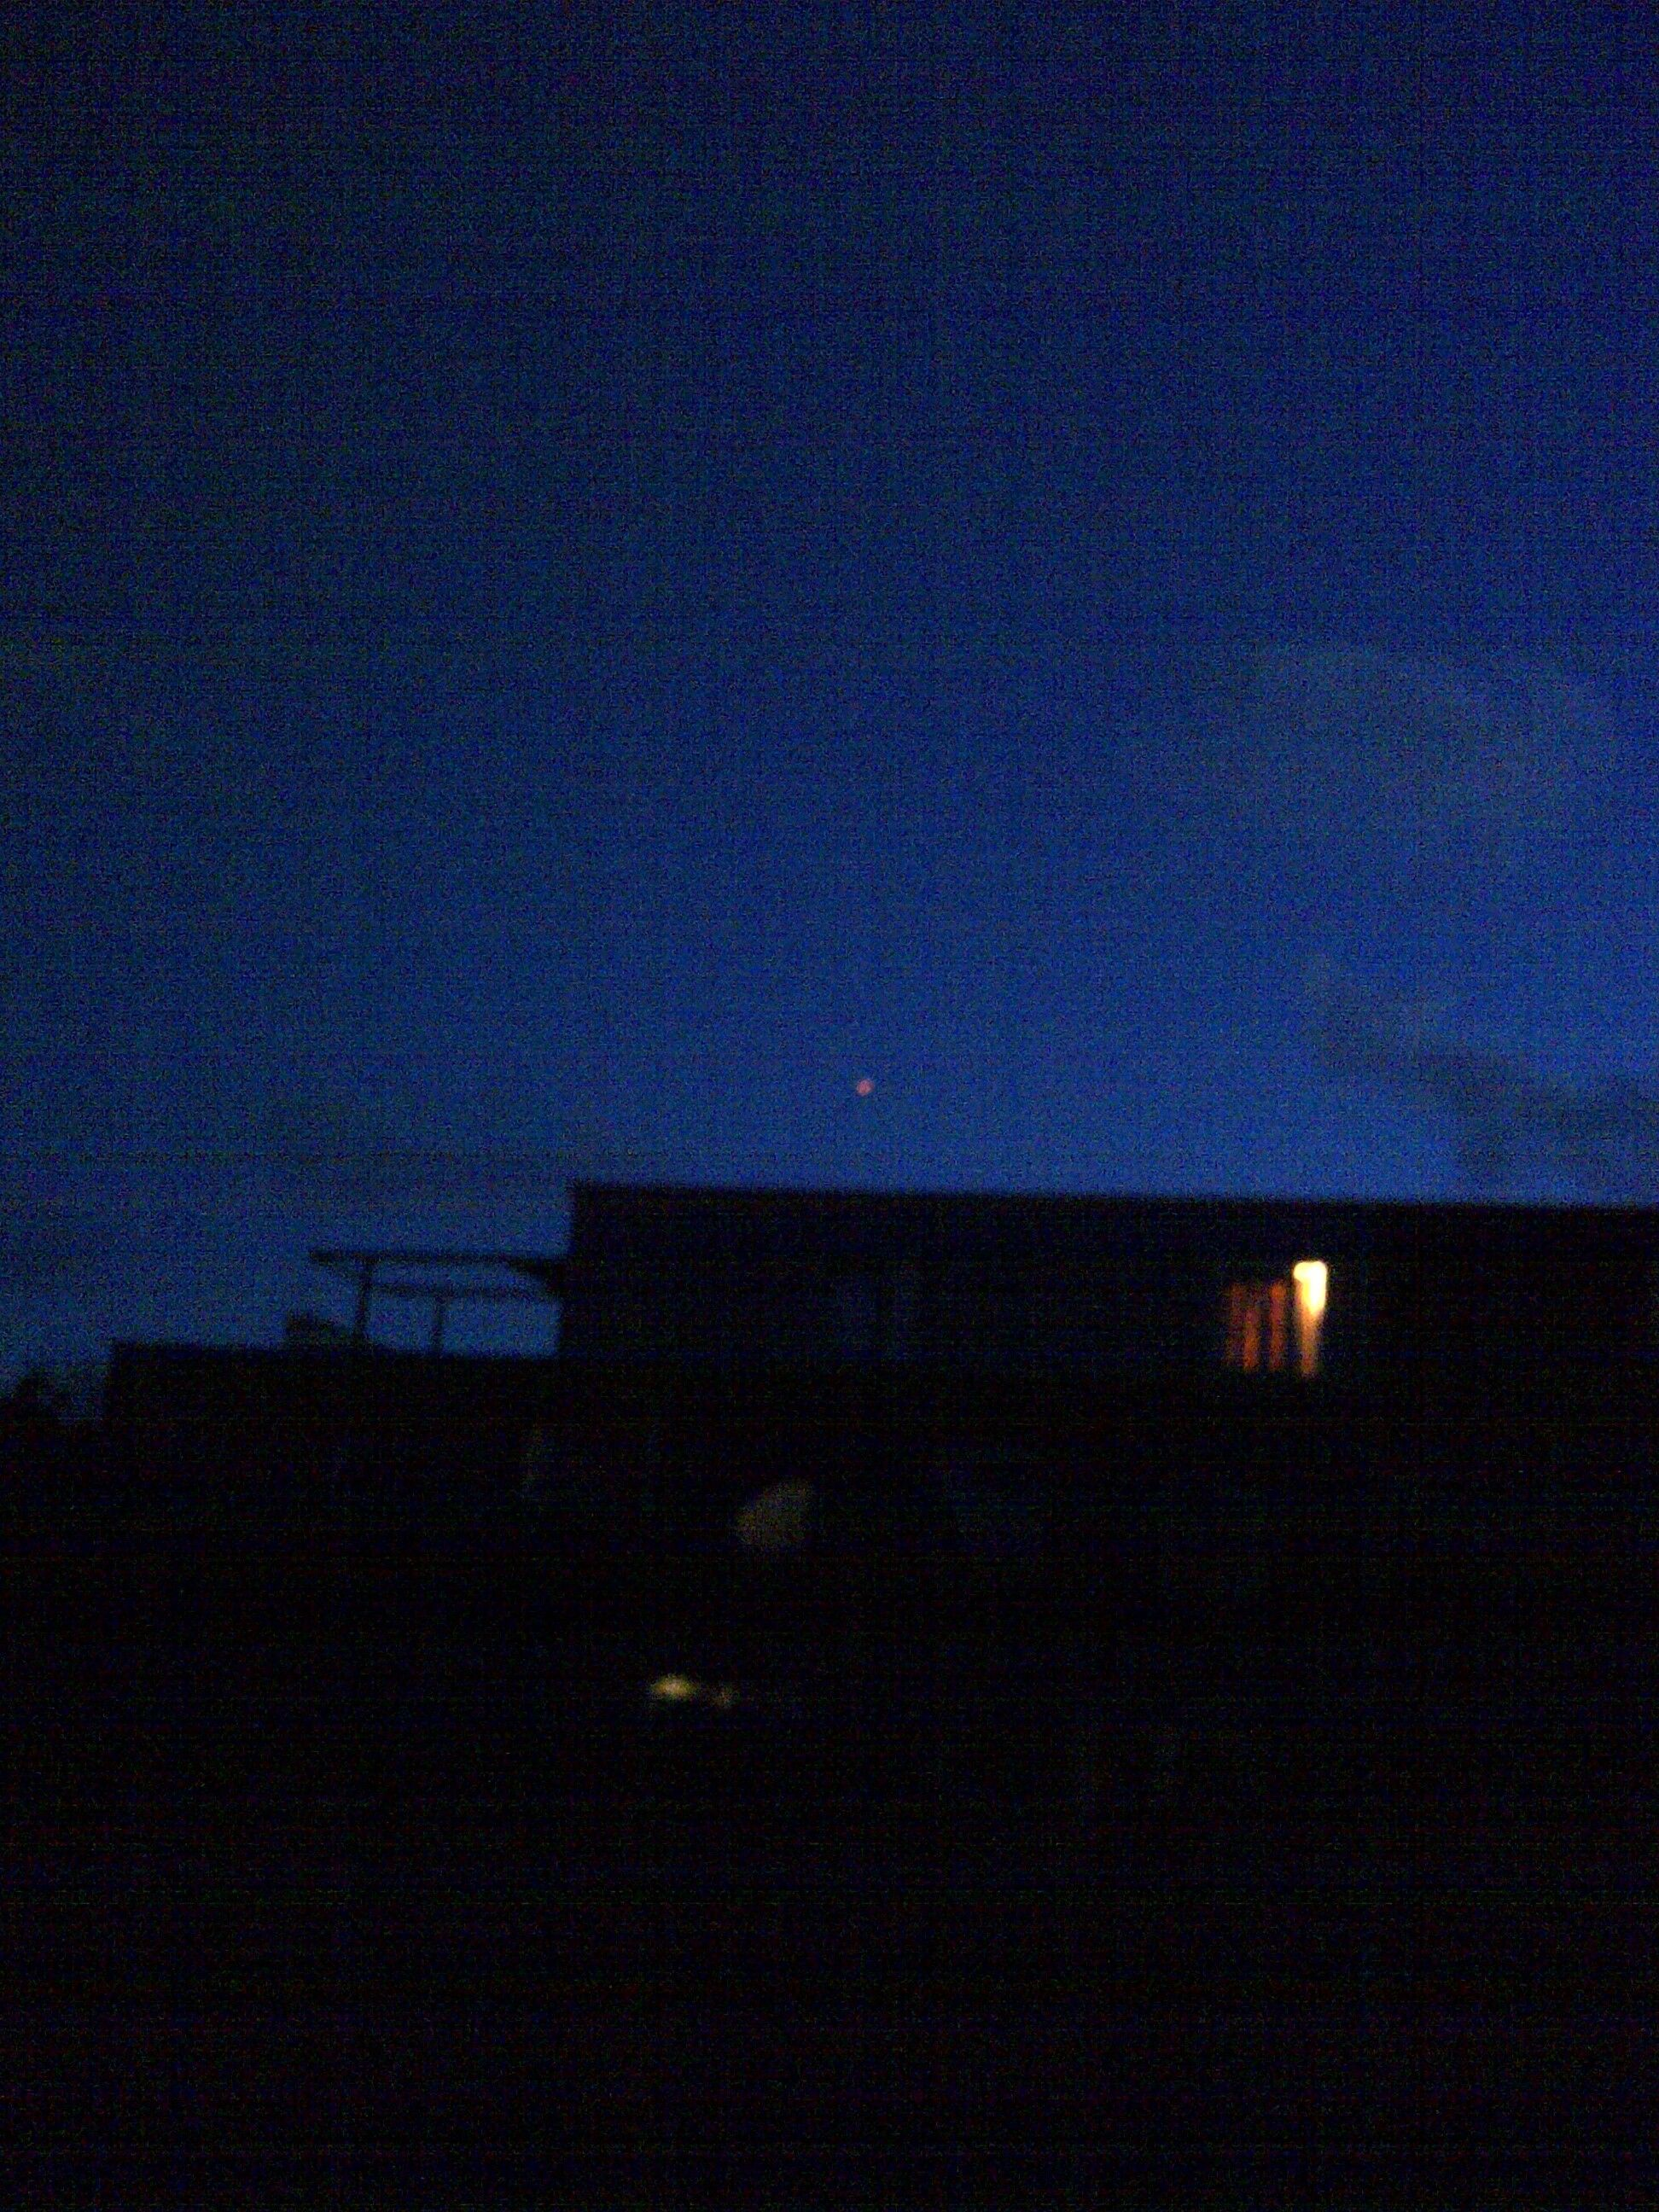 1 Almere-Stad 01-01-2013 Object UFO 1ste Orginele foto Black Berry